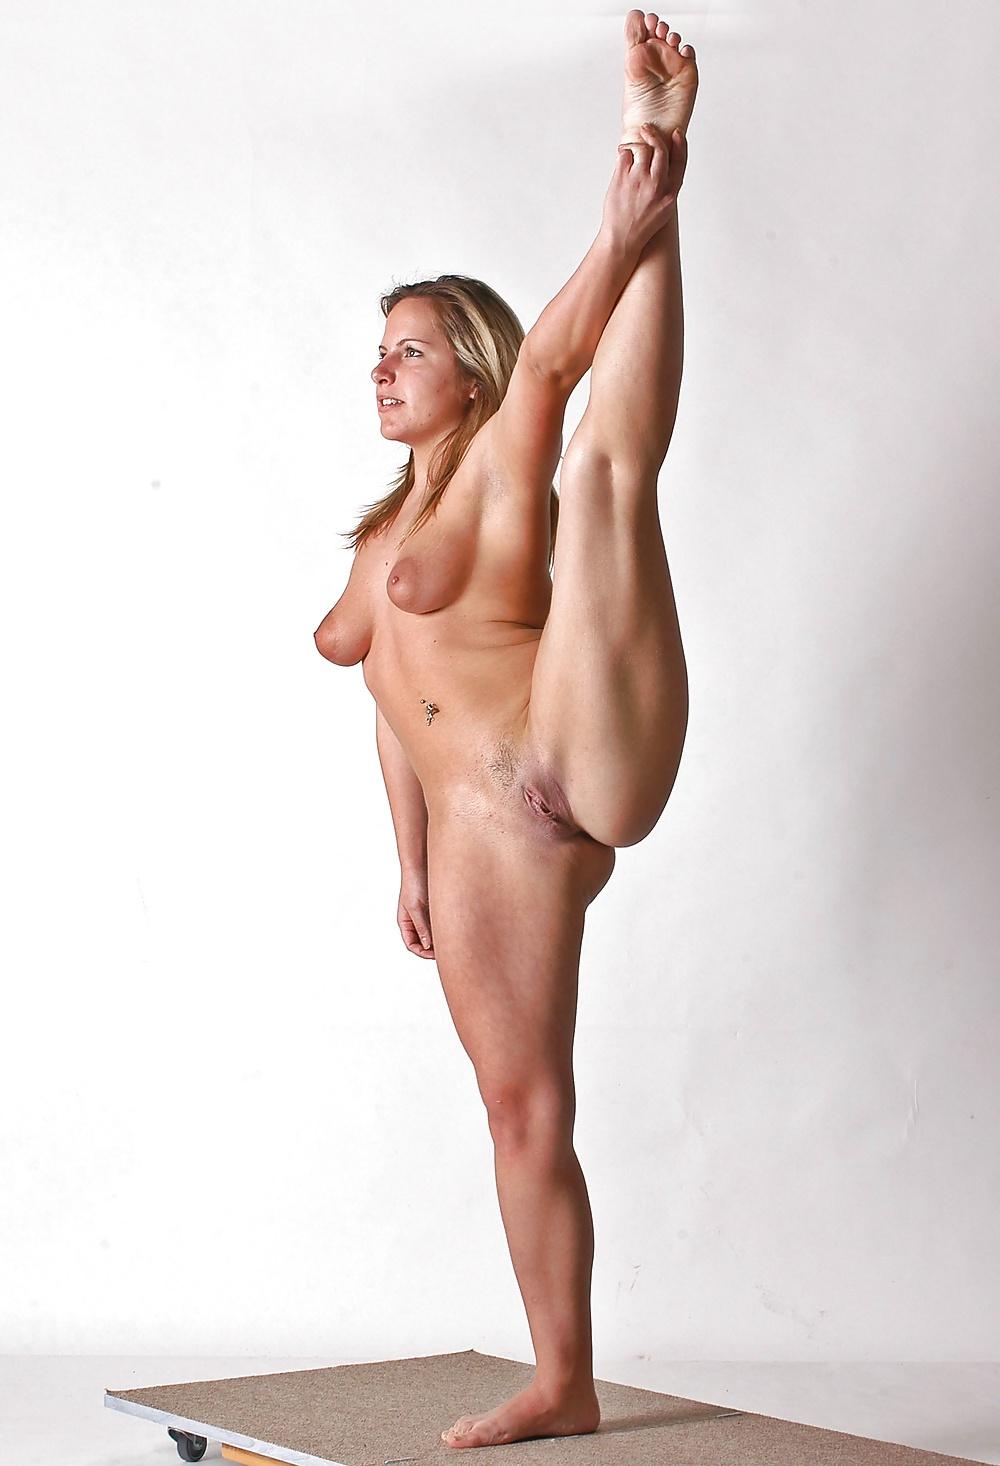 Stunning Brunette Lorena G Rollerskating Naked Spreading Legs Wide Open